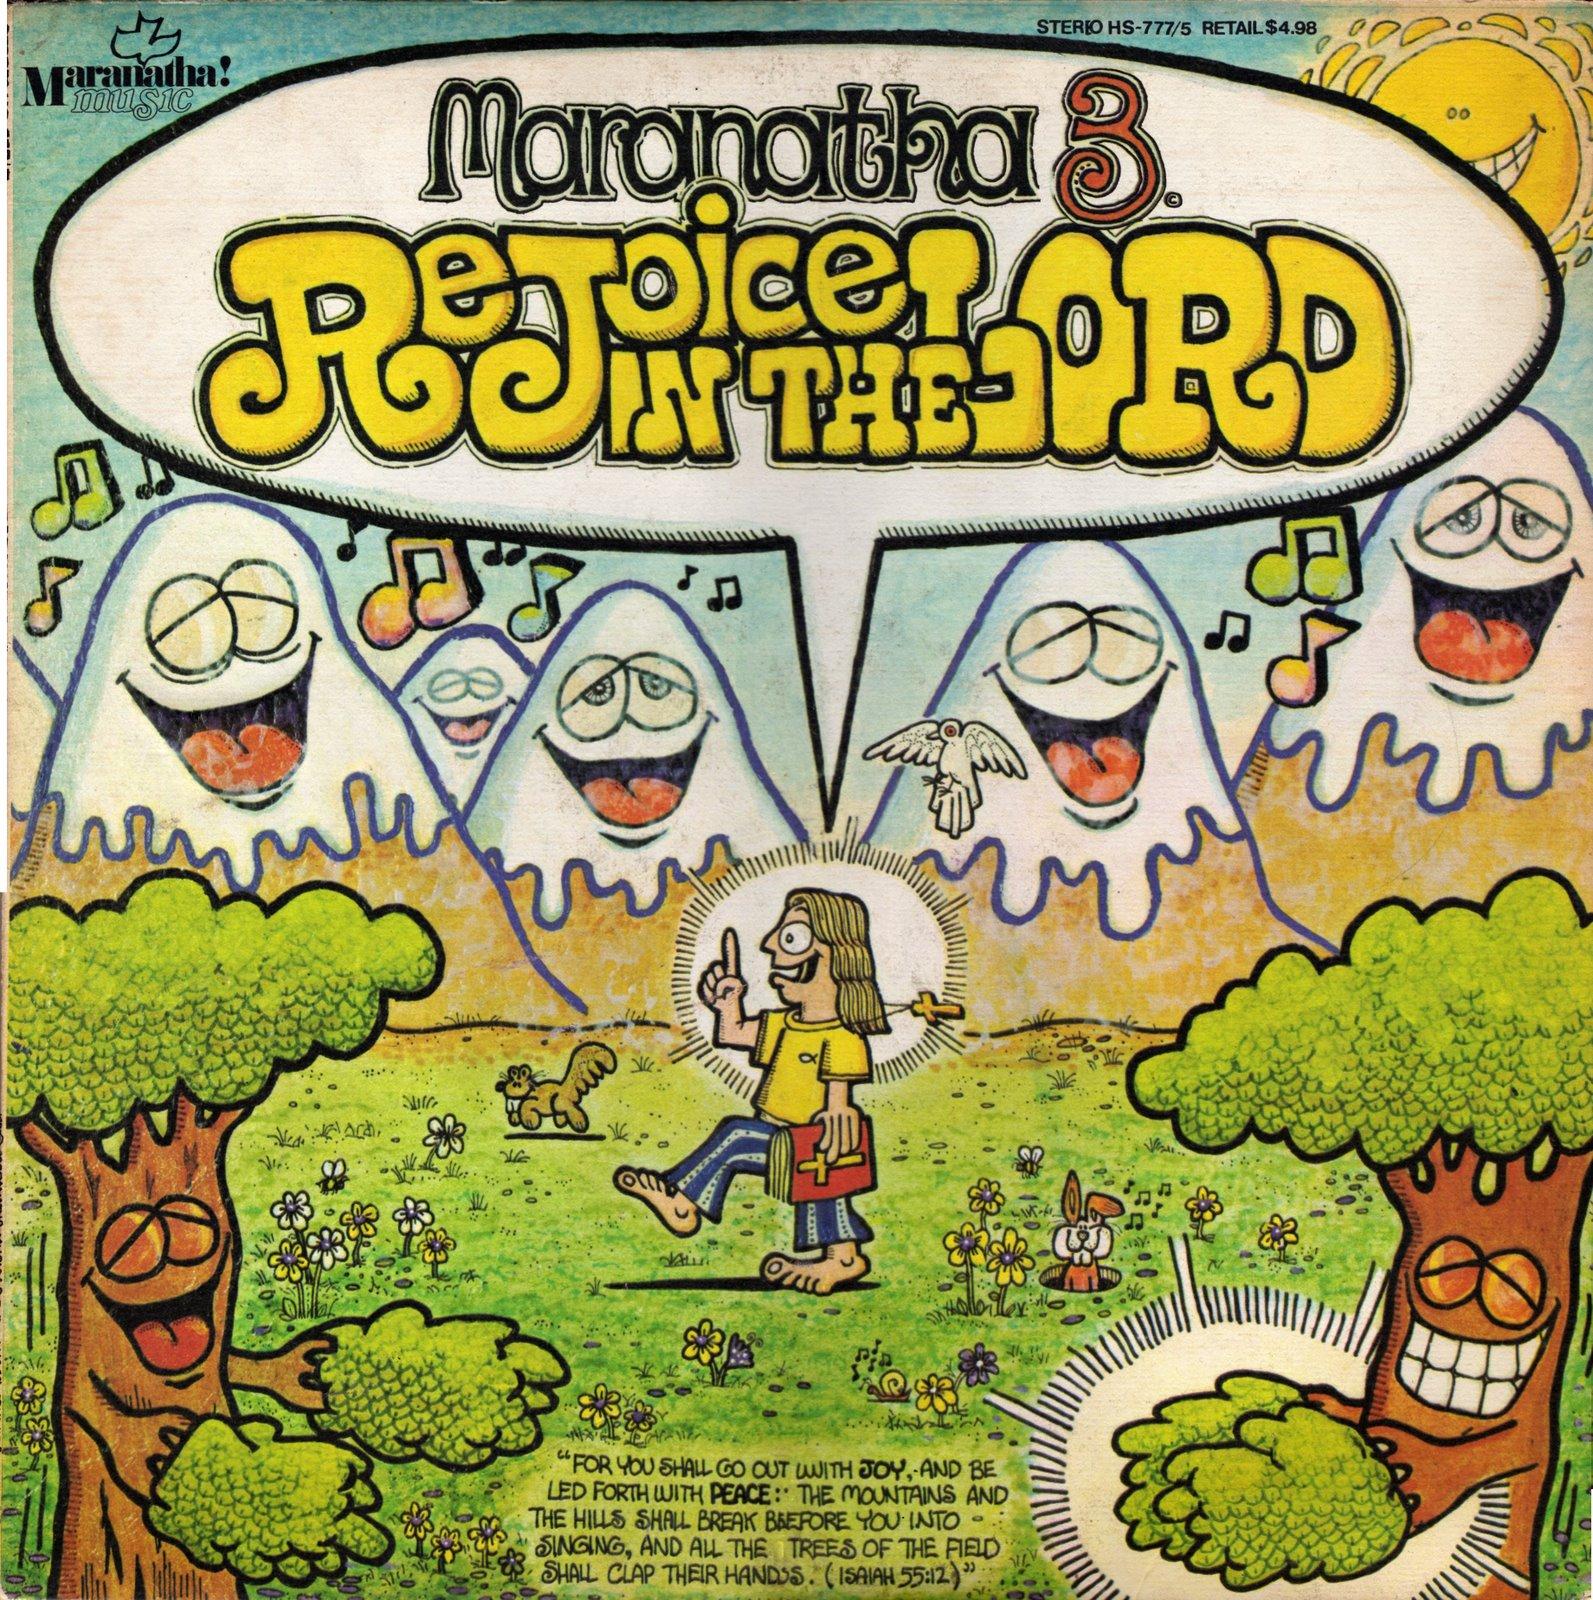 Diverse artister –Maranatha 3. Rejoice in the Lord [LP, 1973]